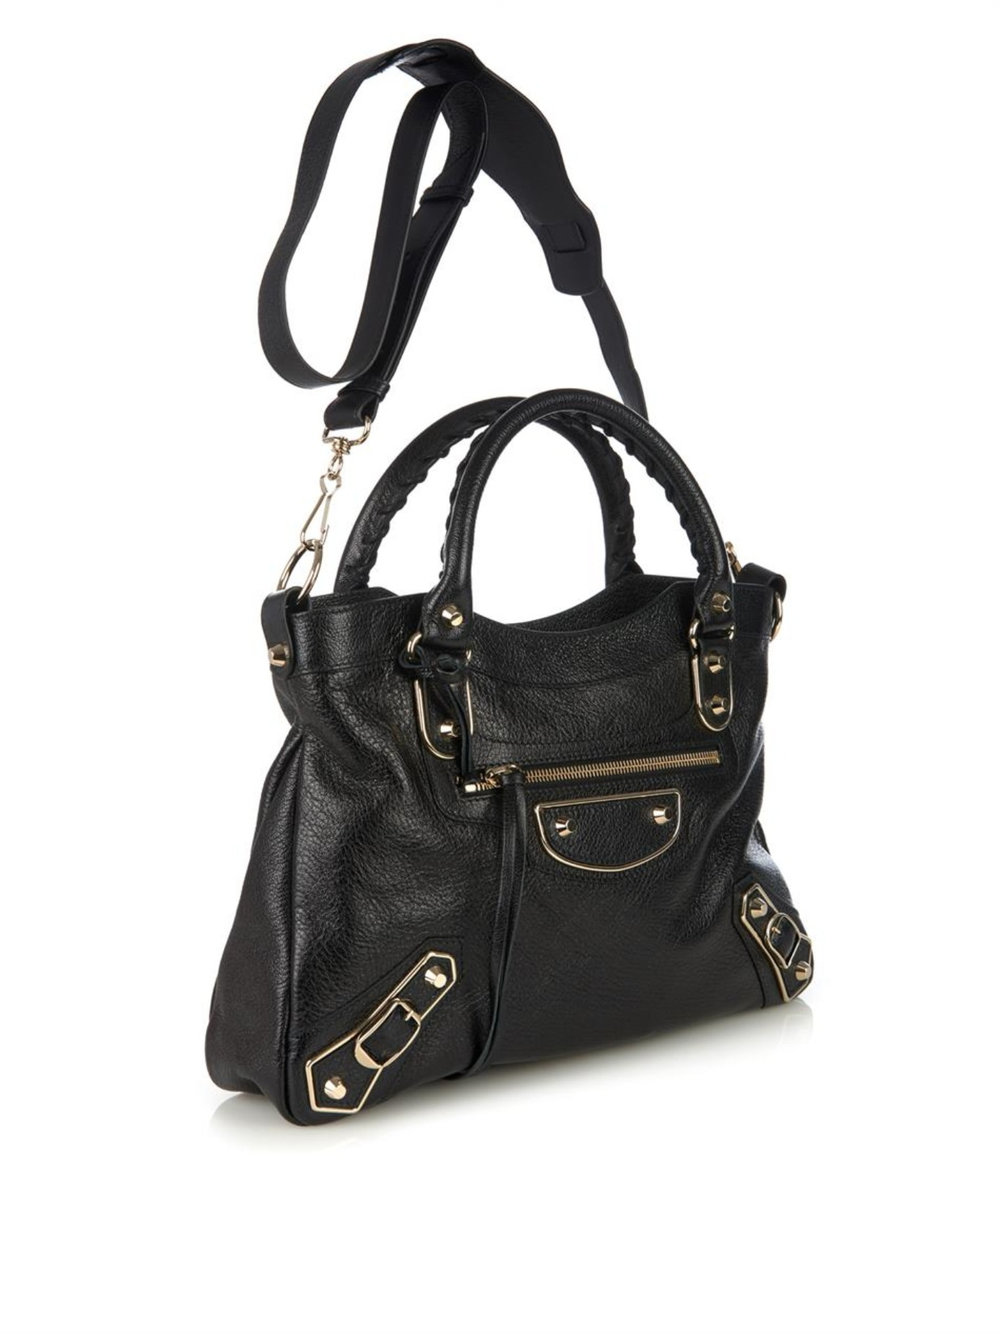 balenciaga-black-classic-town-leather-cross-body-bag-product-2-617780715-normal.jpg